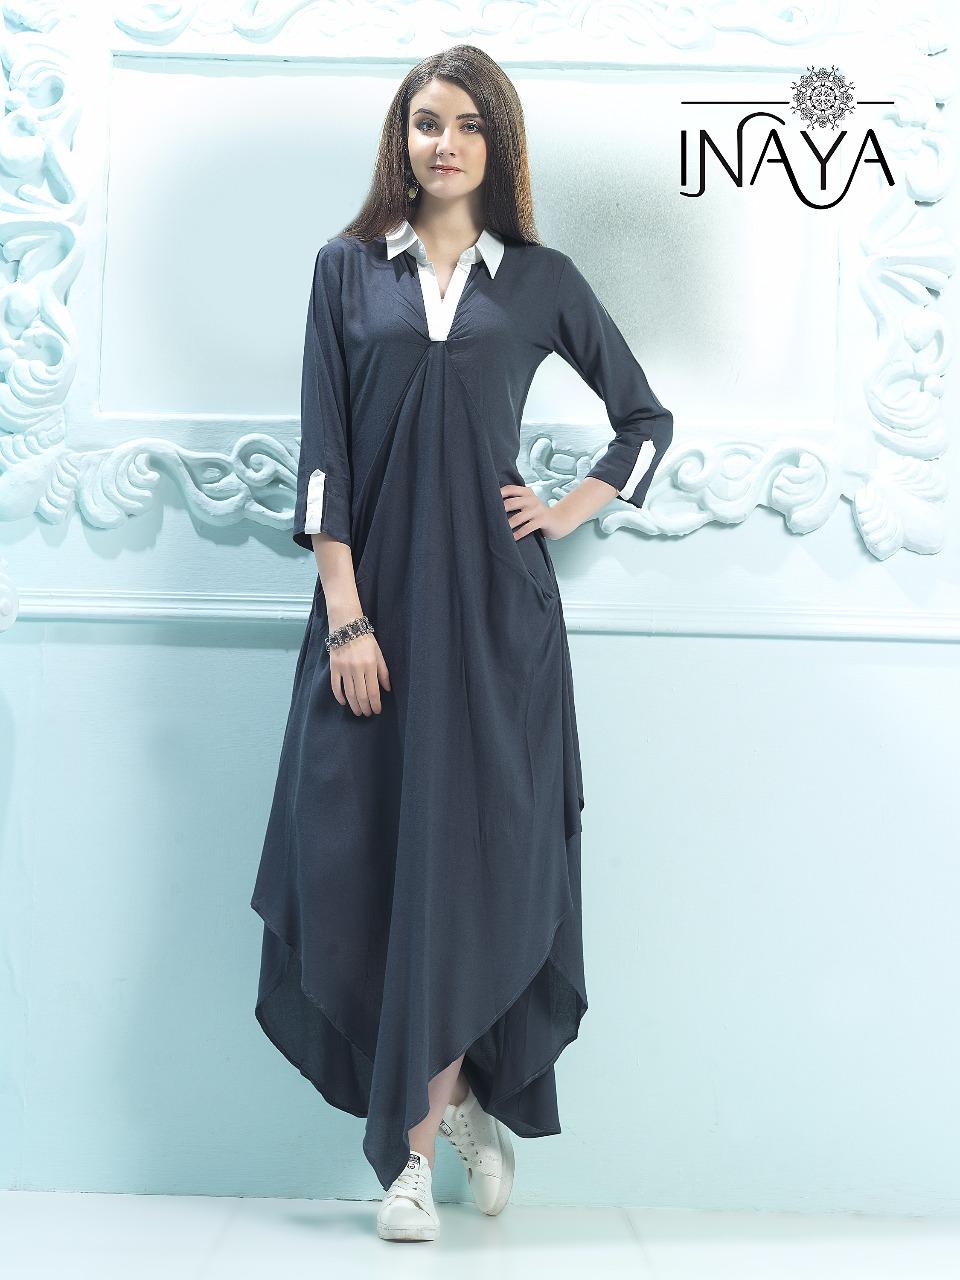 Inaya By Studio Libas White Collar K-23 English Blue